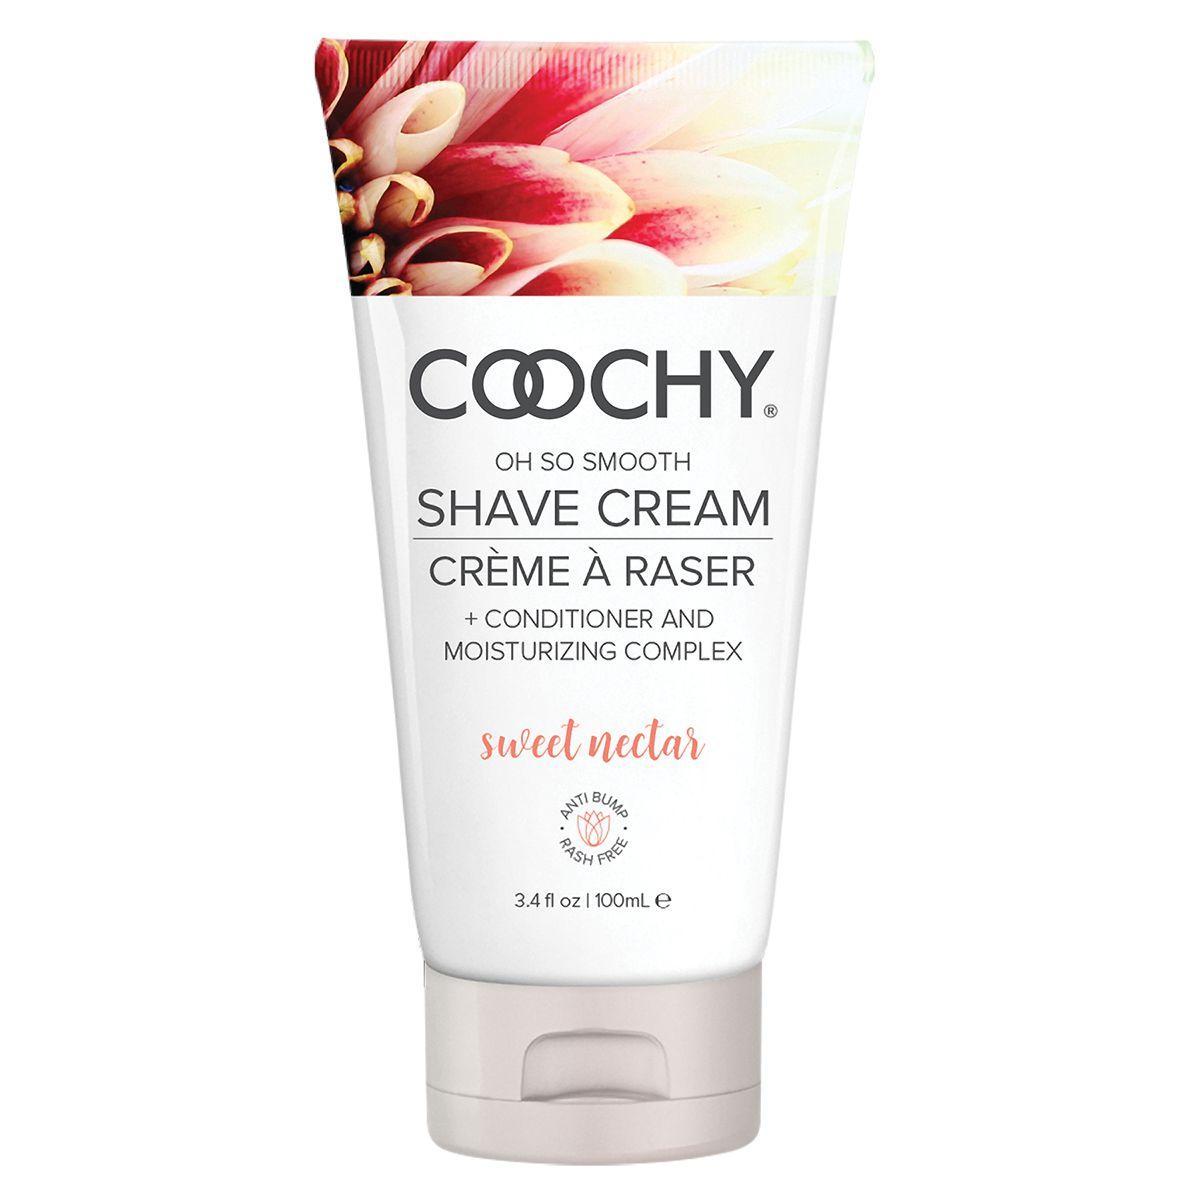 Увлажняющий комплекс COOCHY Sweet Nectar - 100 мл.-7572